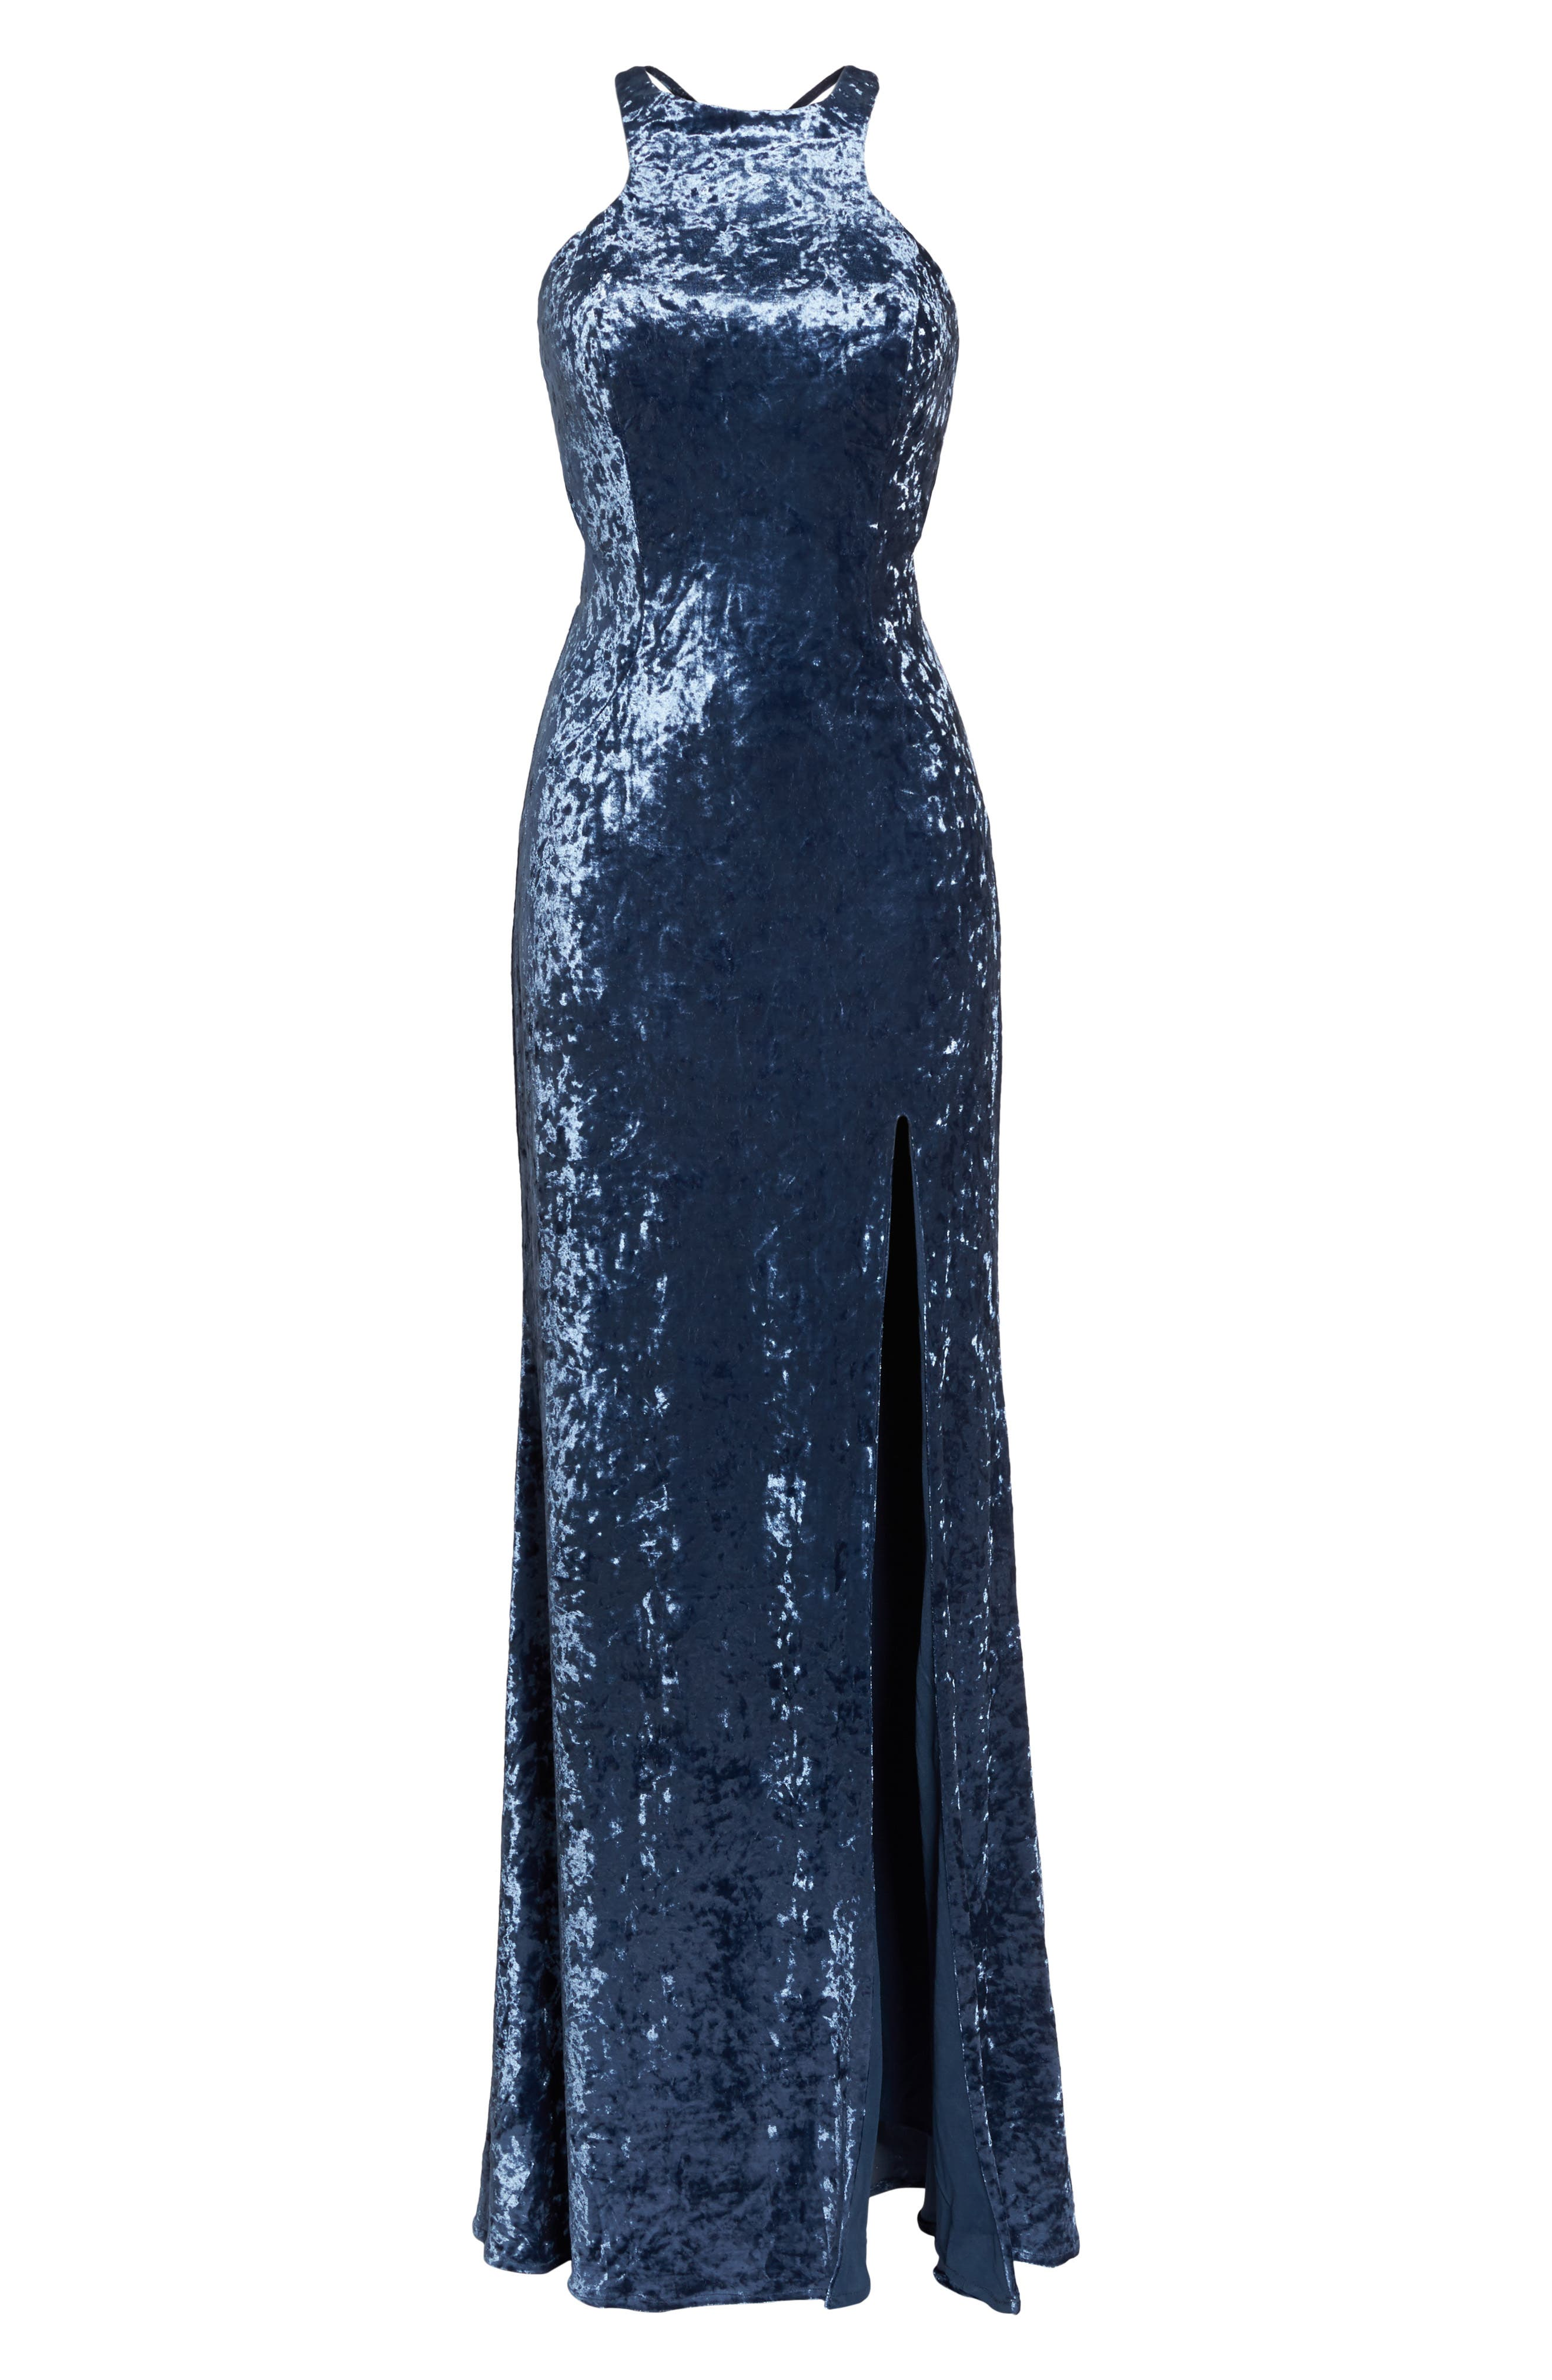 Strappy Crushed Velvet Gown,                             Alternate thumbnail 6, color,                             SLATE BLUE